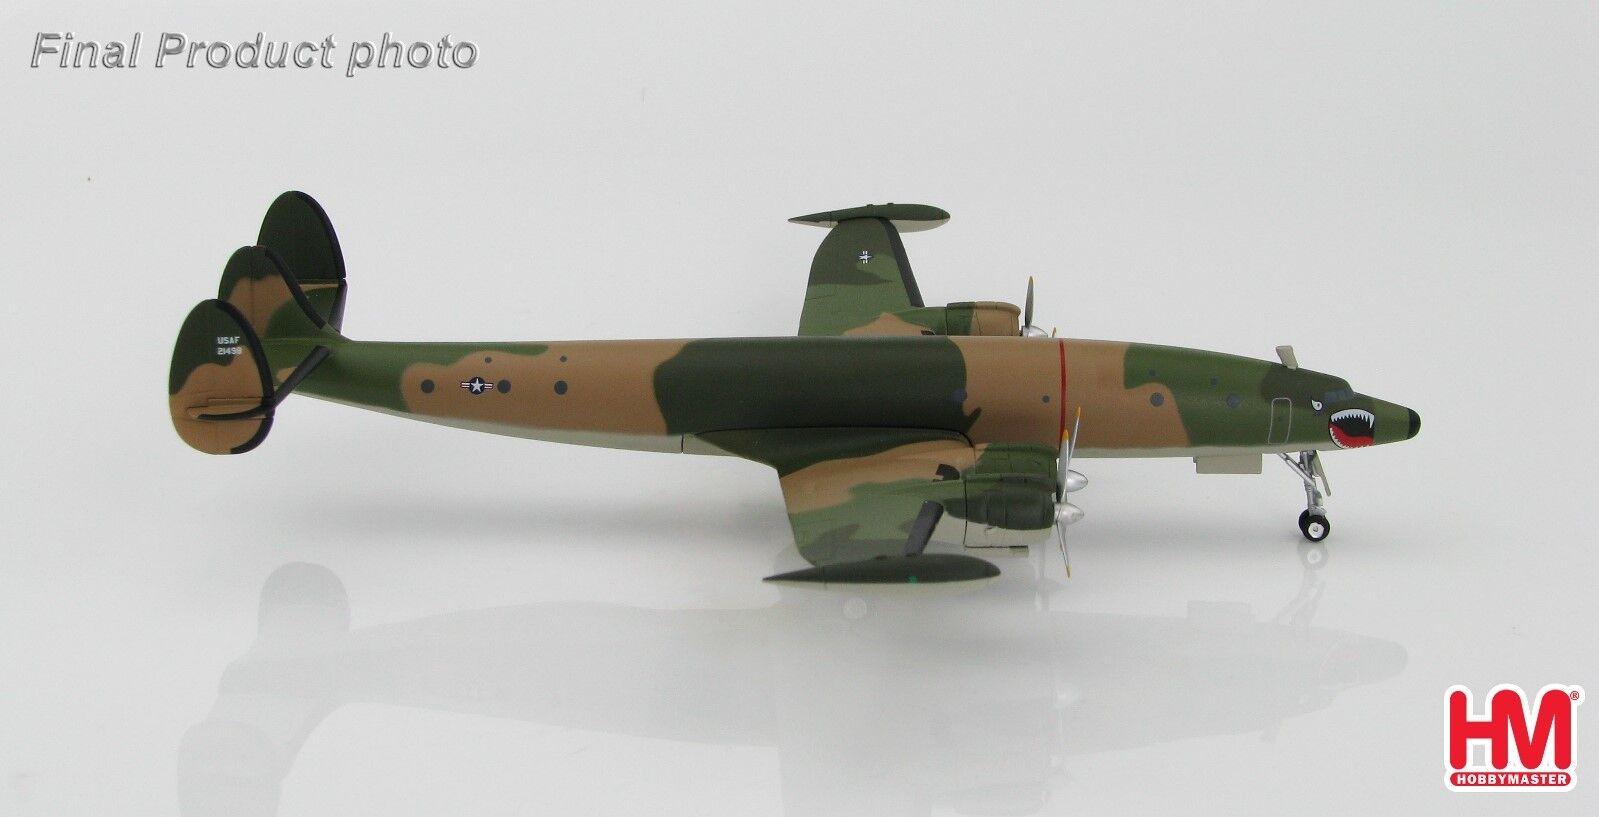 Hobbymaster HL9018 1 200 Lockheed EC-121R constelación-USAF 553rd RW